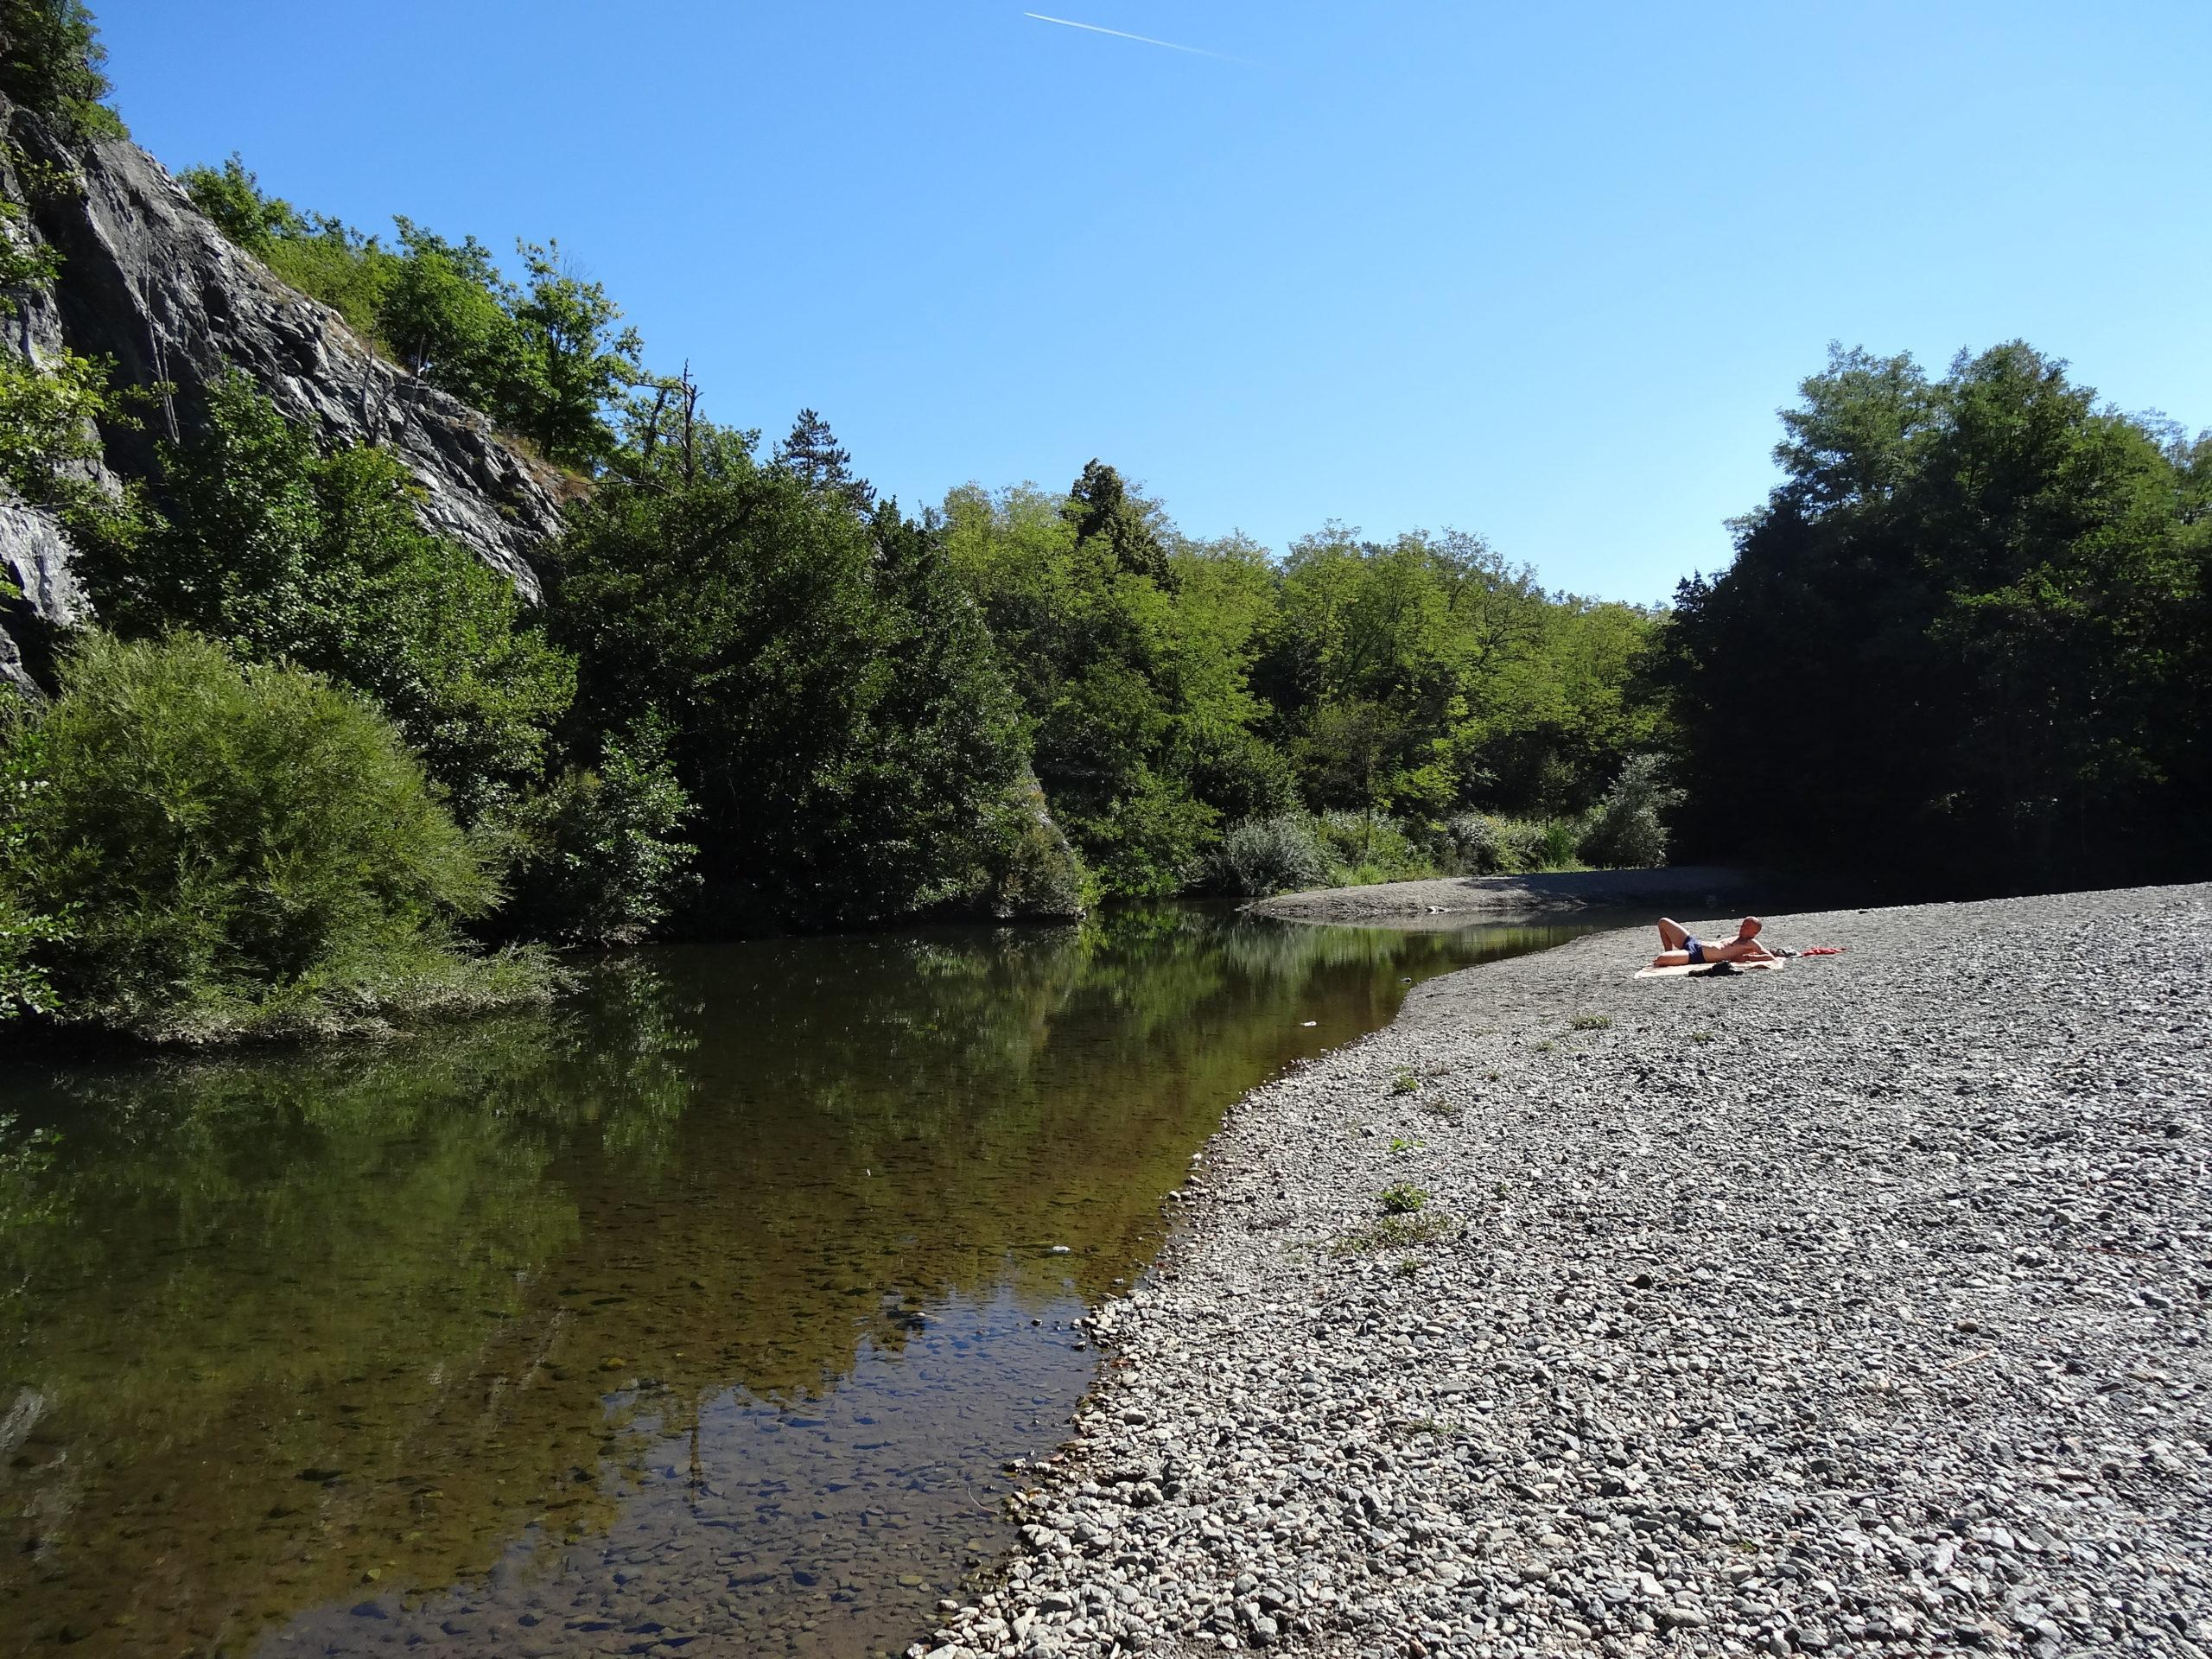 lago dei gulli 4 sassello liguria